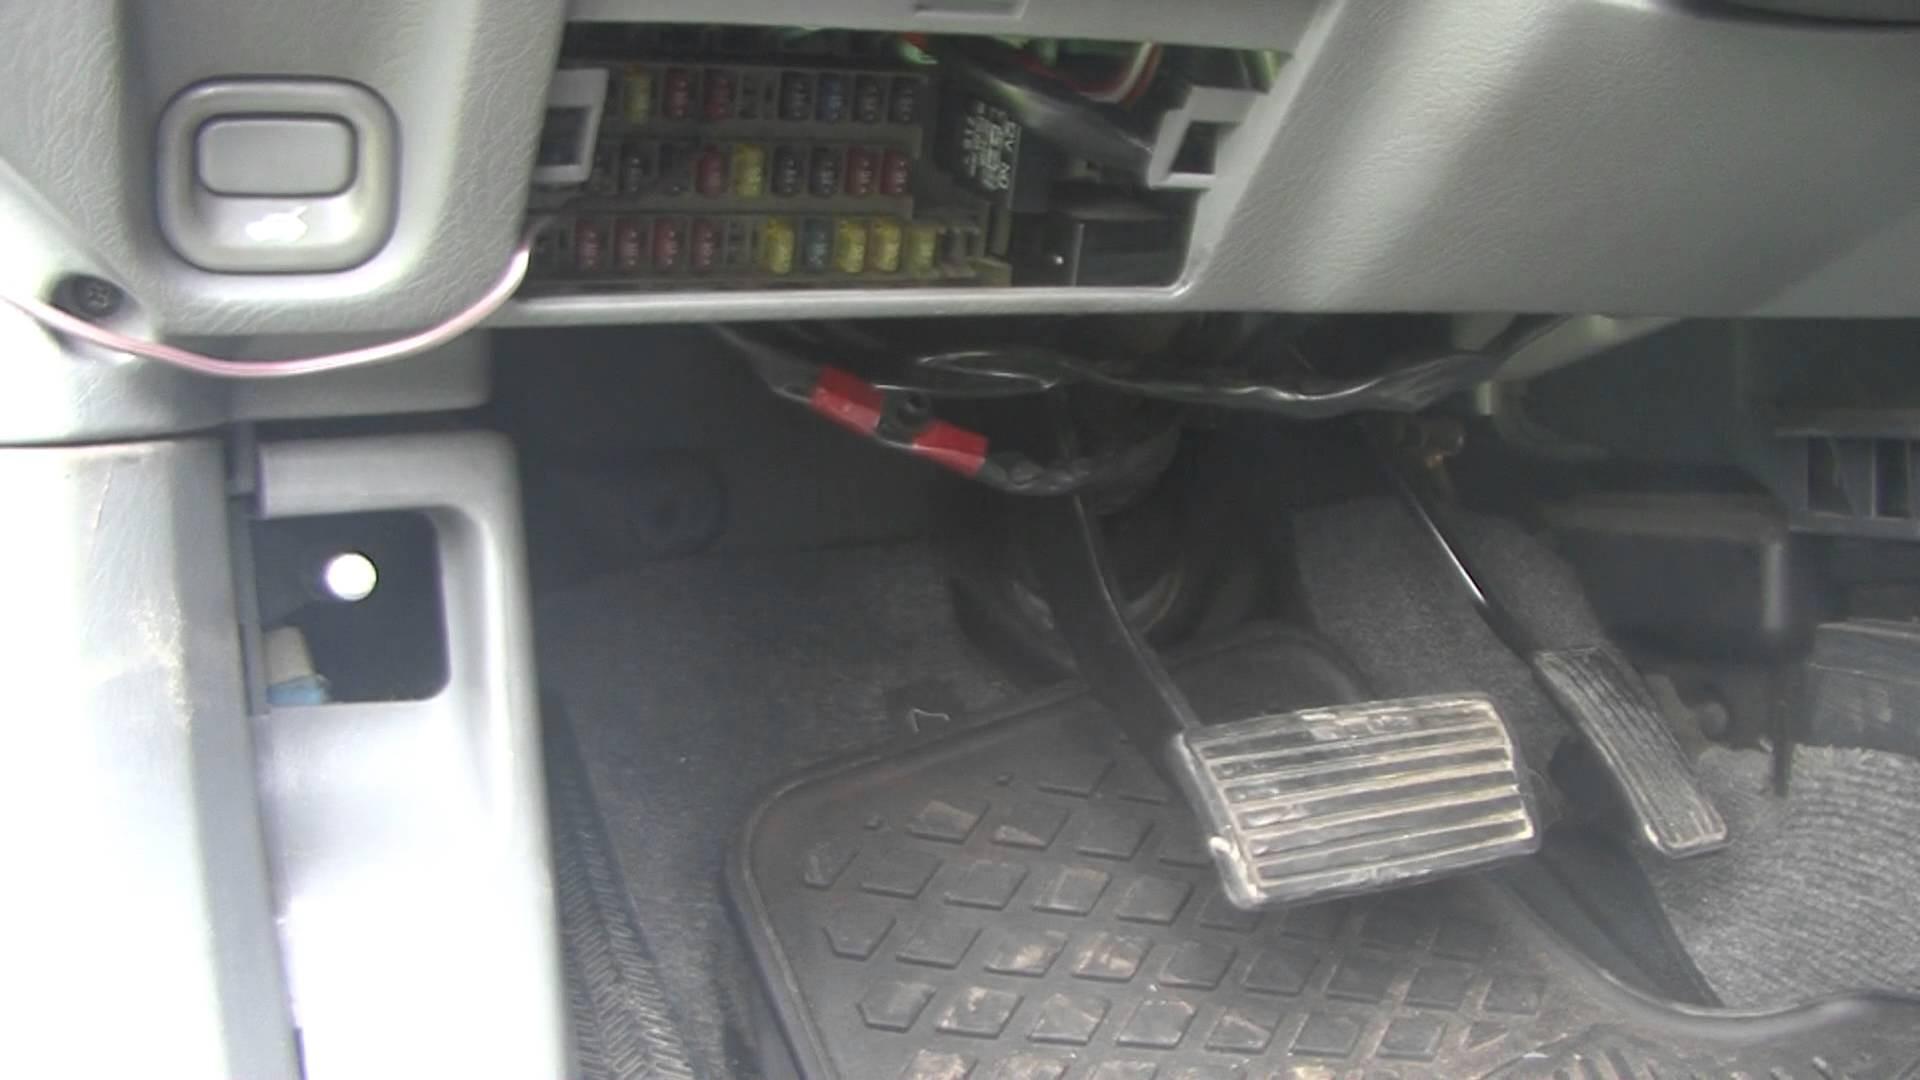 2002 Honda Crv Parts Diagram Honda How to Find Obd2 Plug Location On Cr V